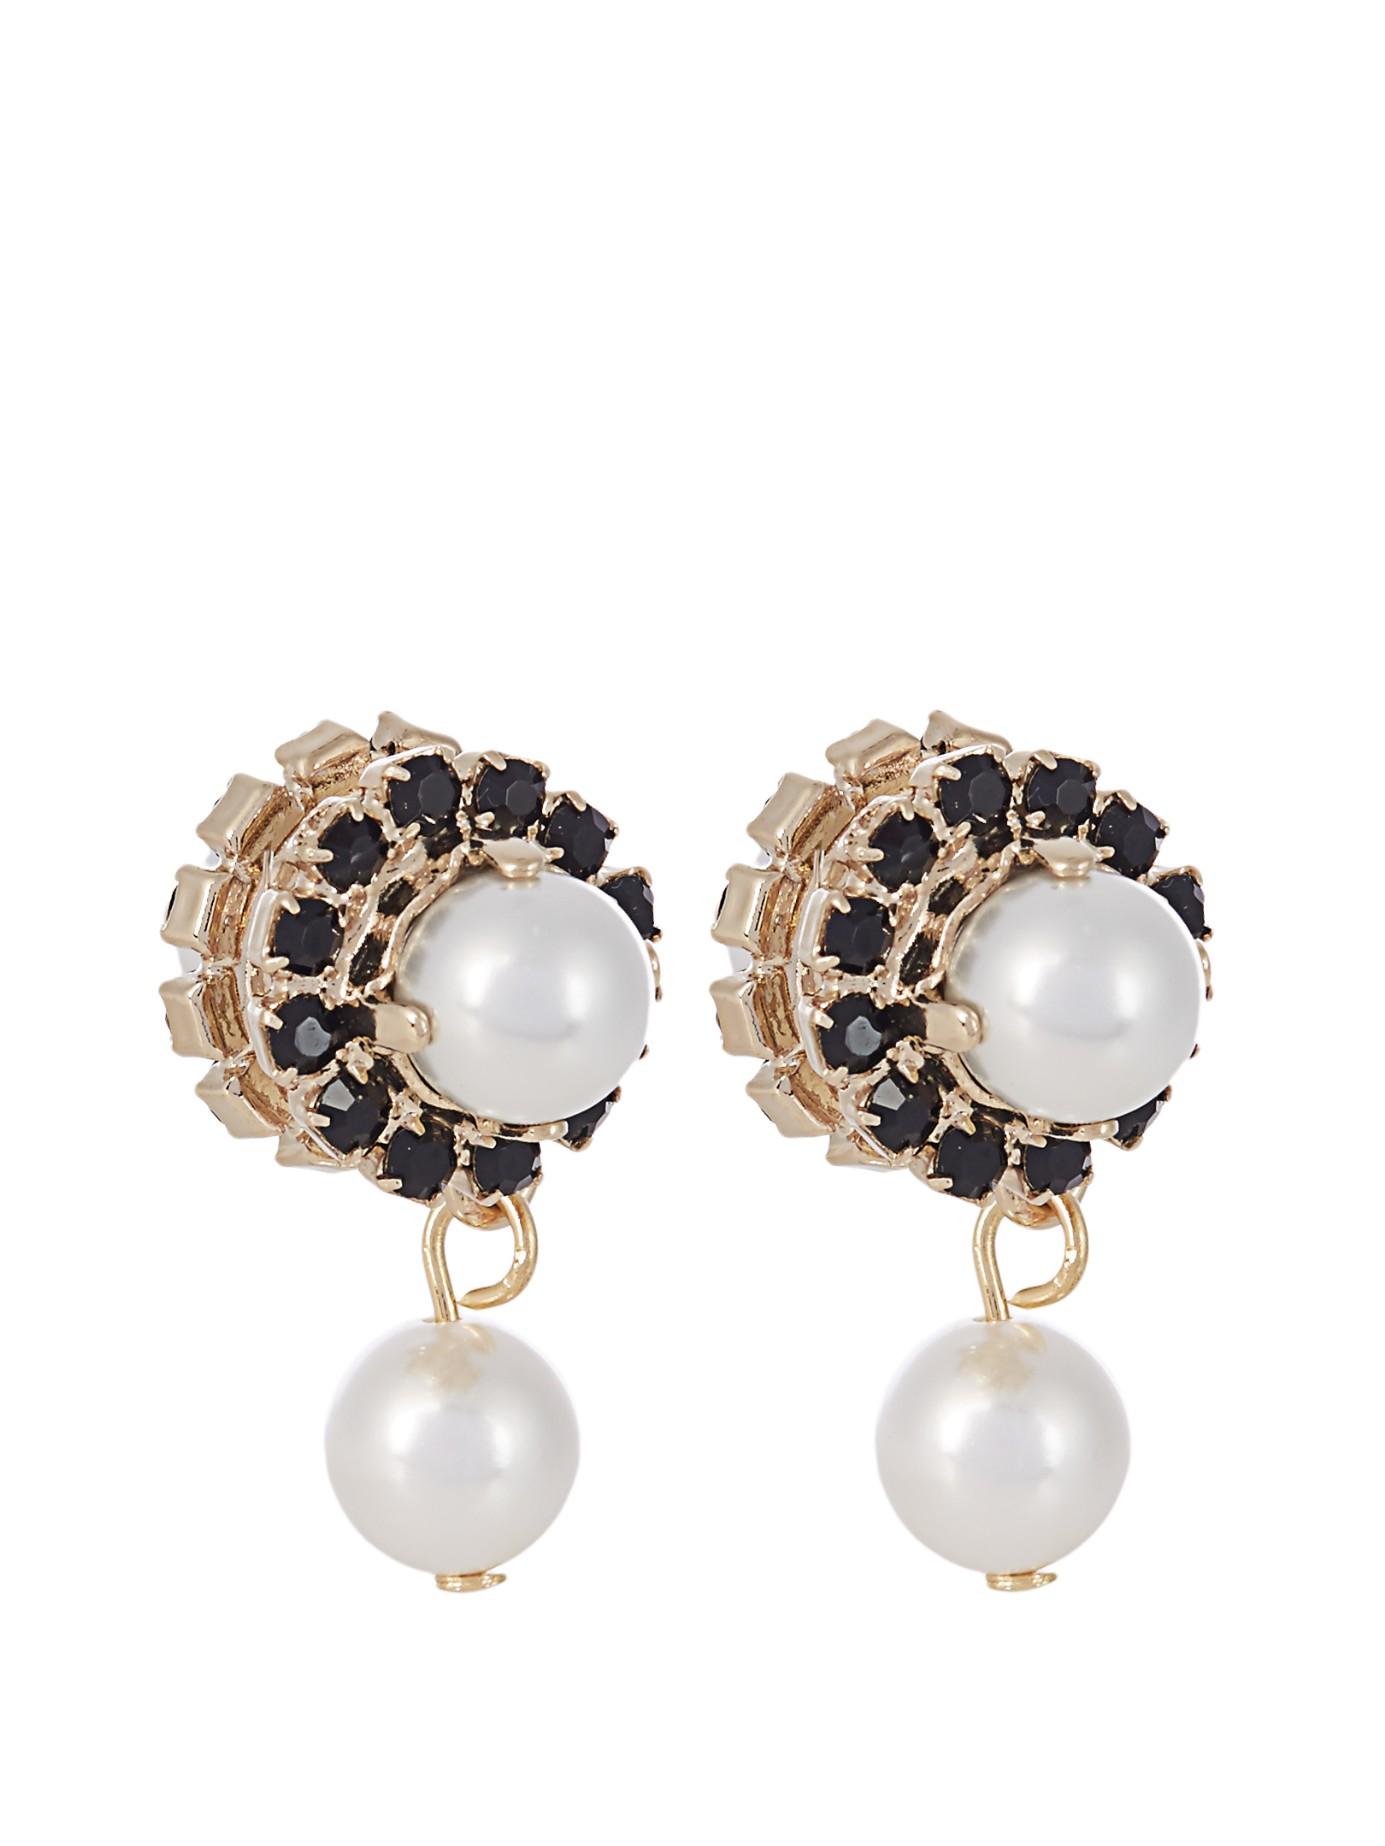 Beautiful Hypoallergenic Pure Titanium Hoop EarringsMagnetic Earrings For Women  Buy